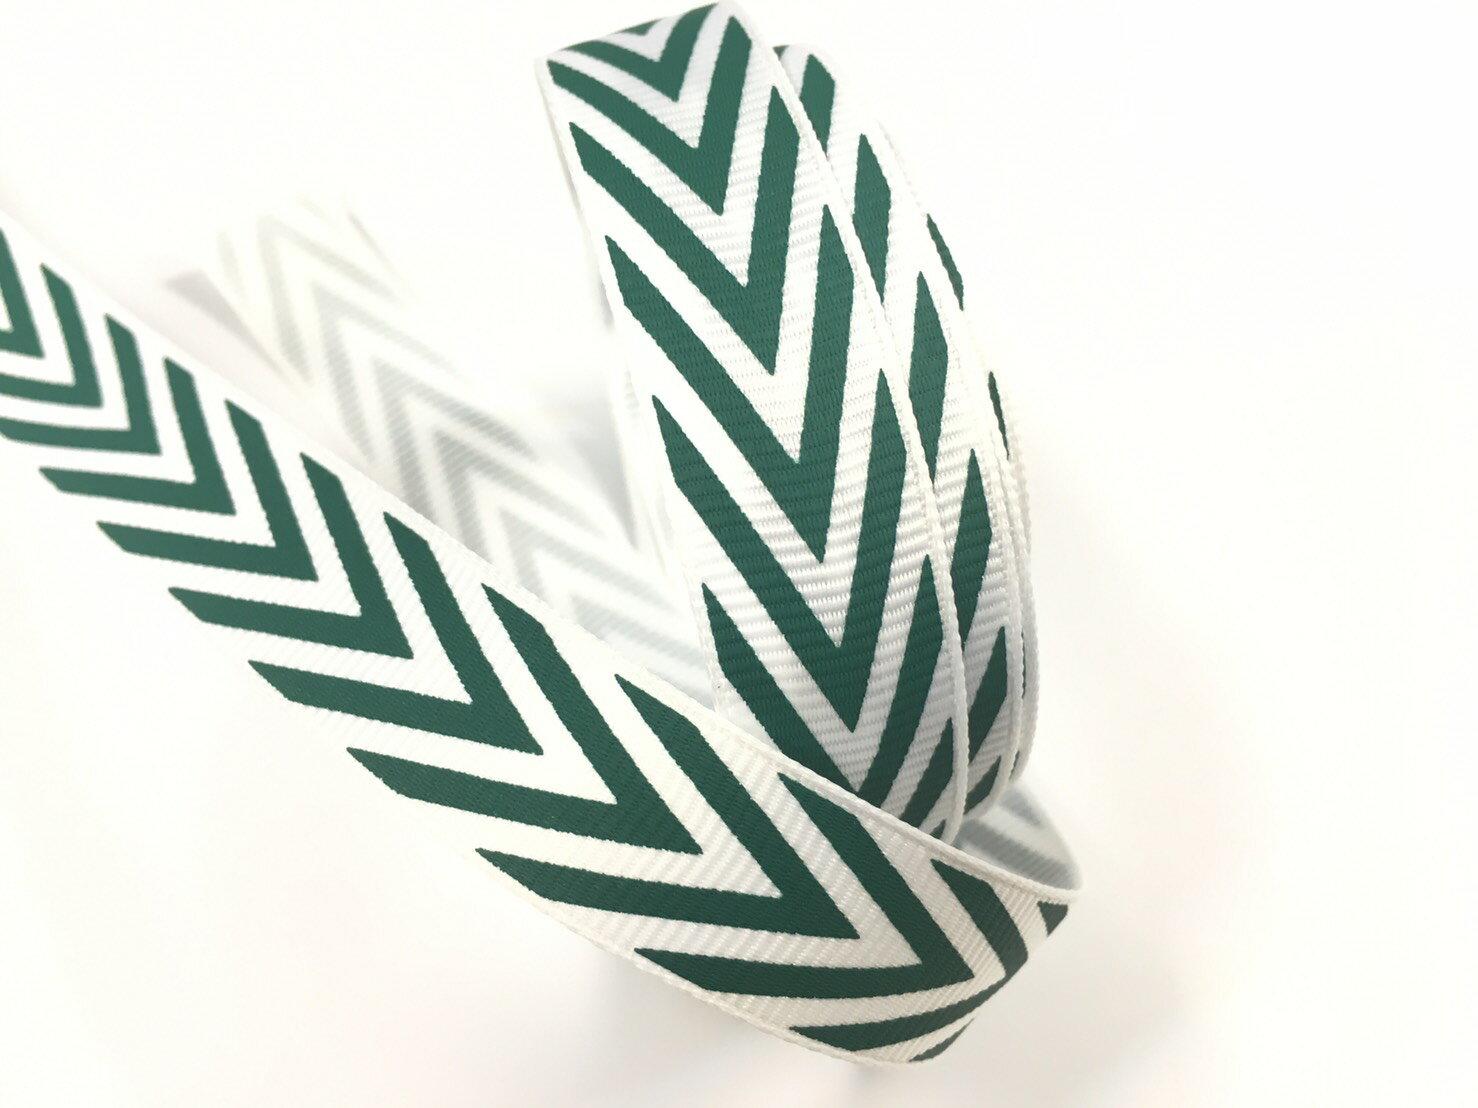 【Crystal Rose緞帶專賣店】羅紋緞帶箭頭15mm3碼裝(3色) 0